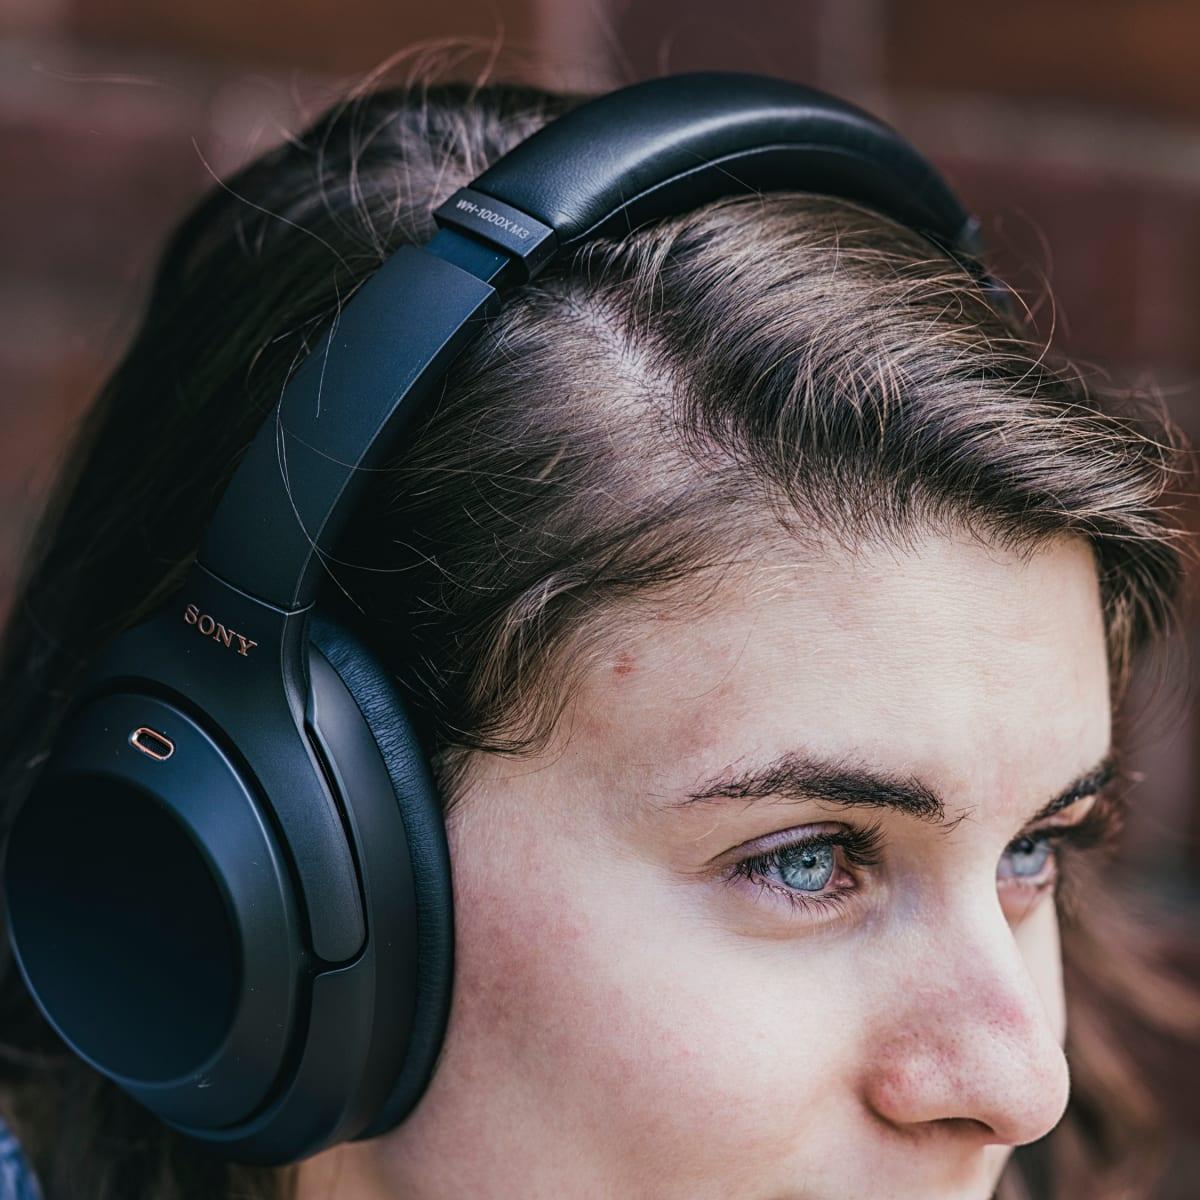 The Best Noise-Canceling Headphones of 2019 - Reviewed Headphones